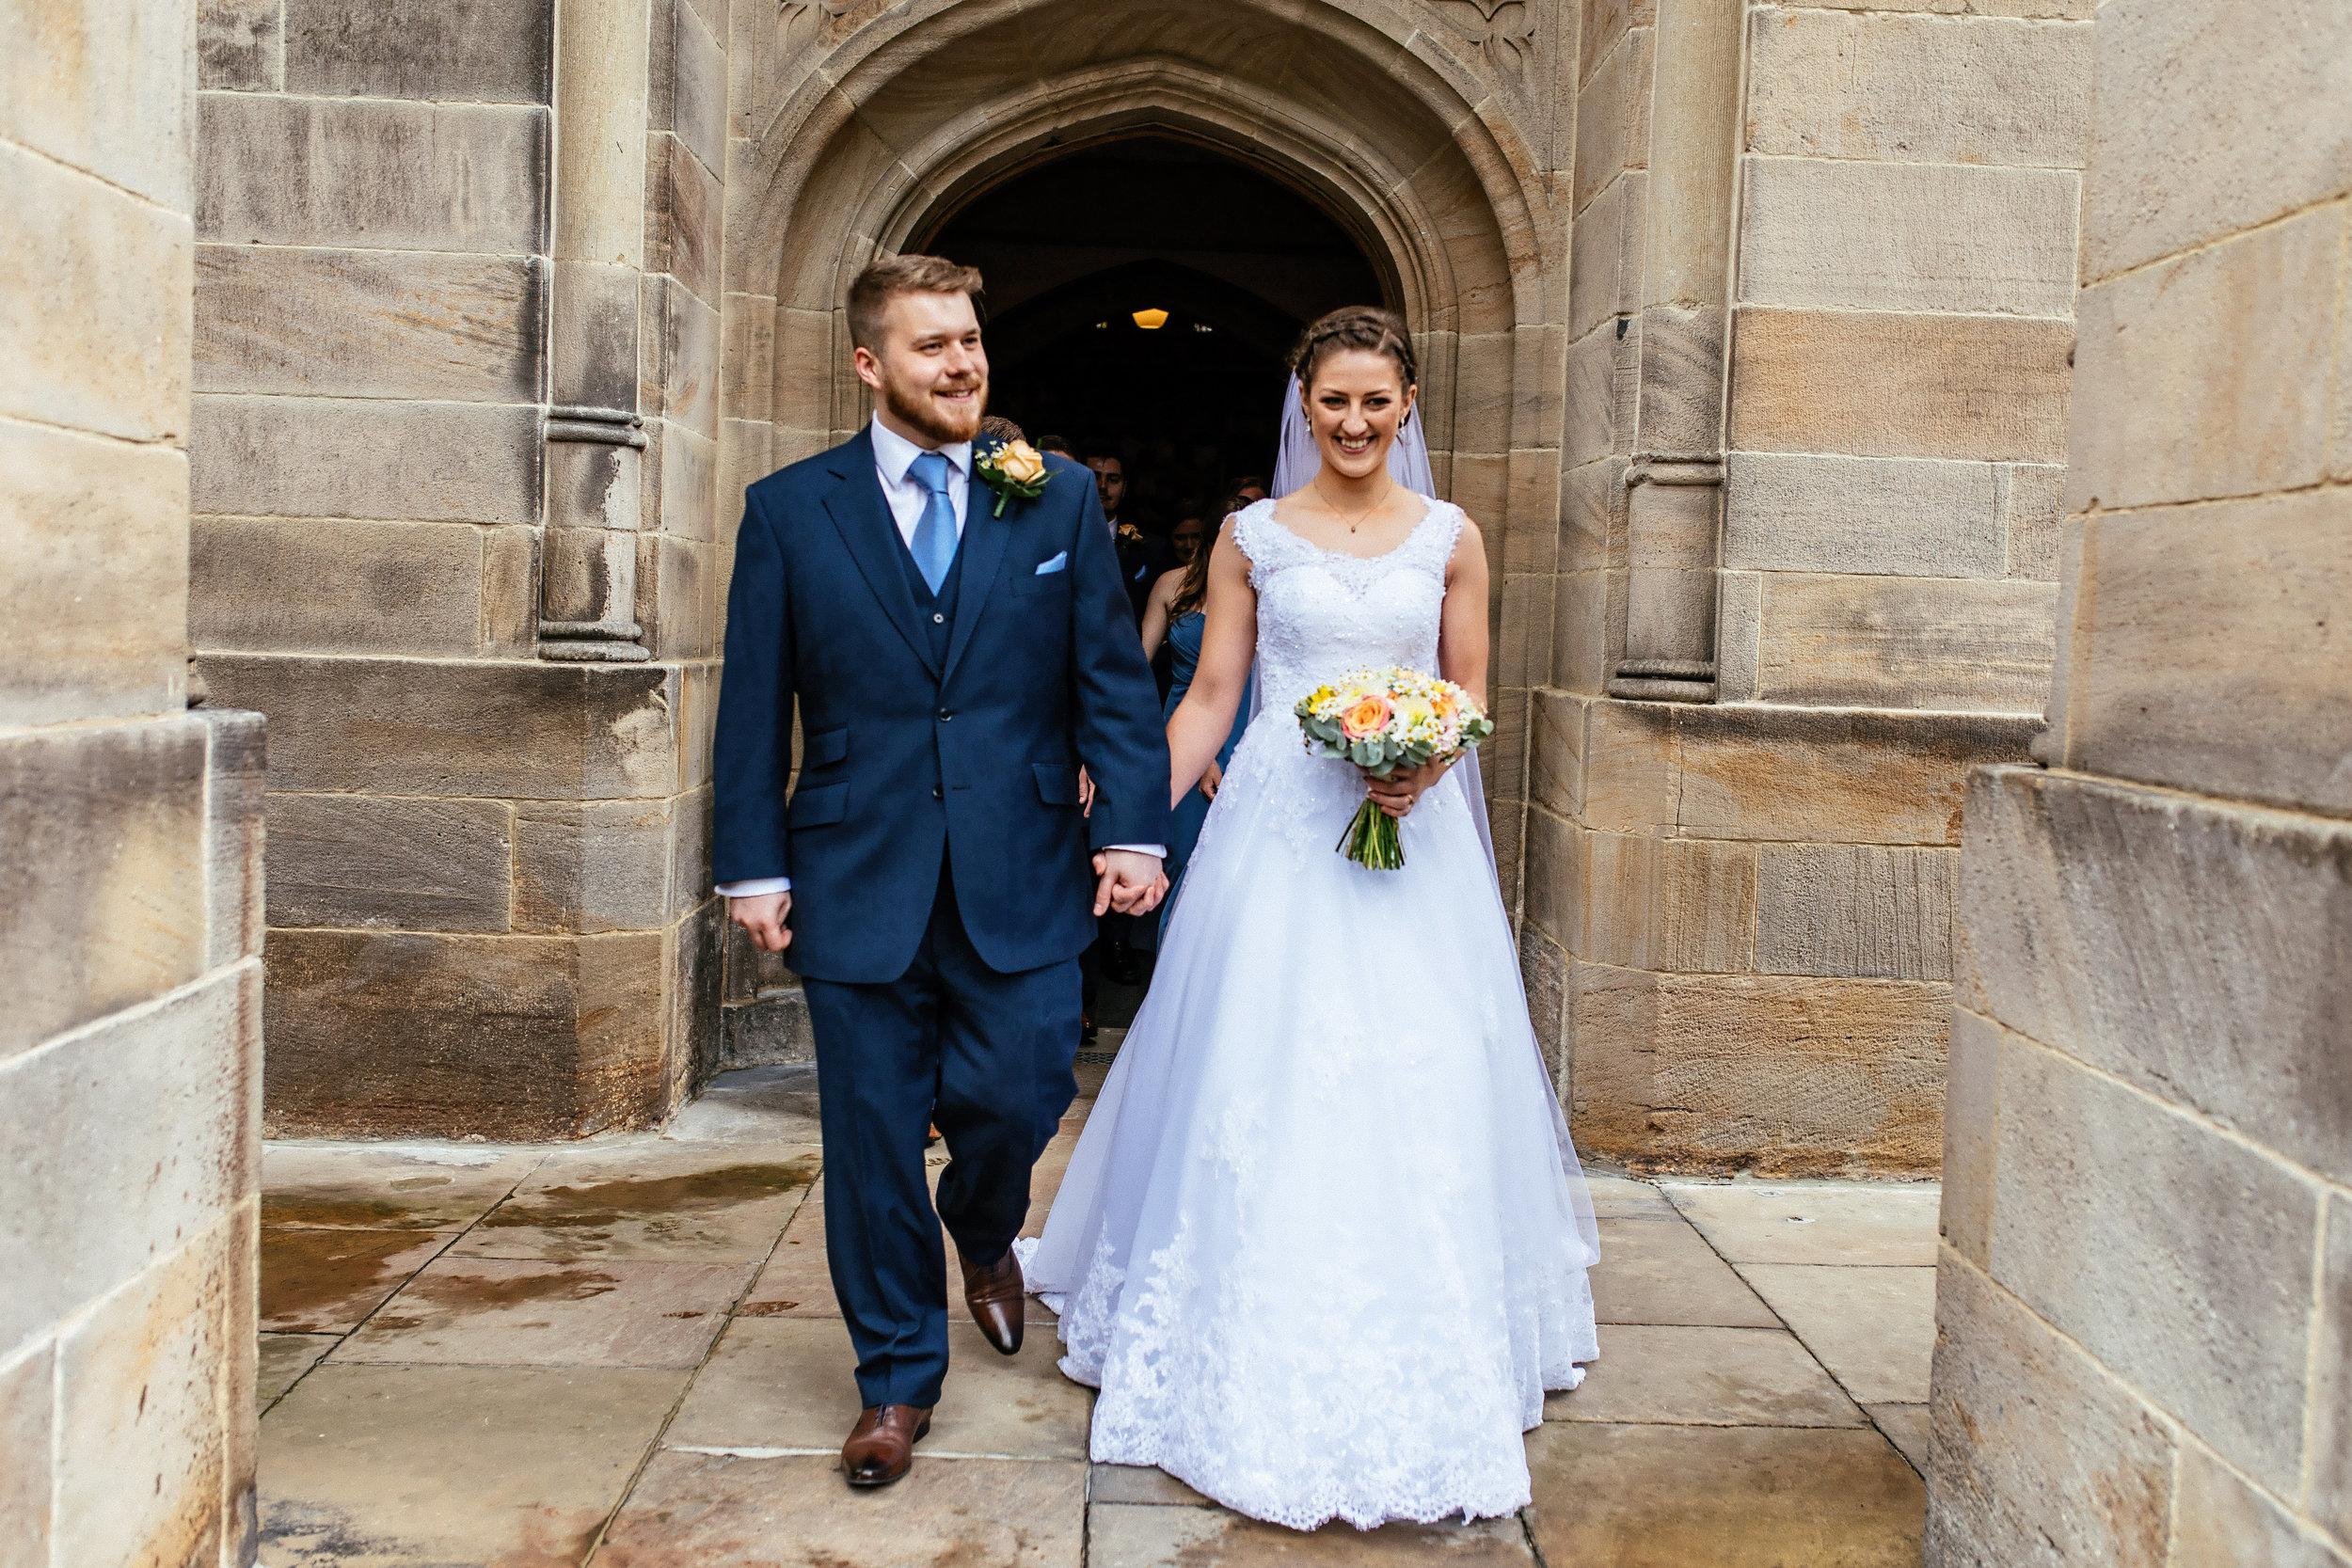 Kathryn-and-Mike-Wedding-Highlights-35.jpg